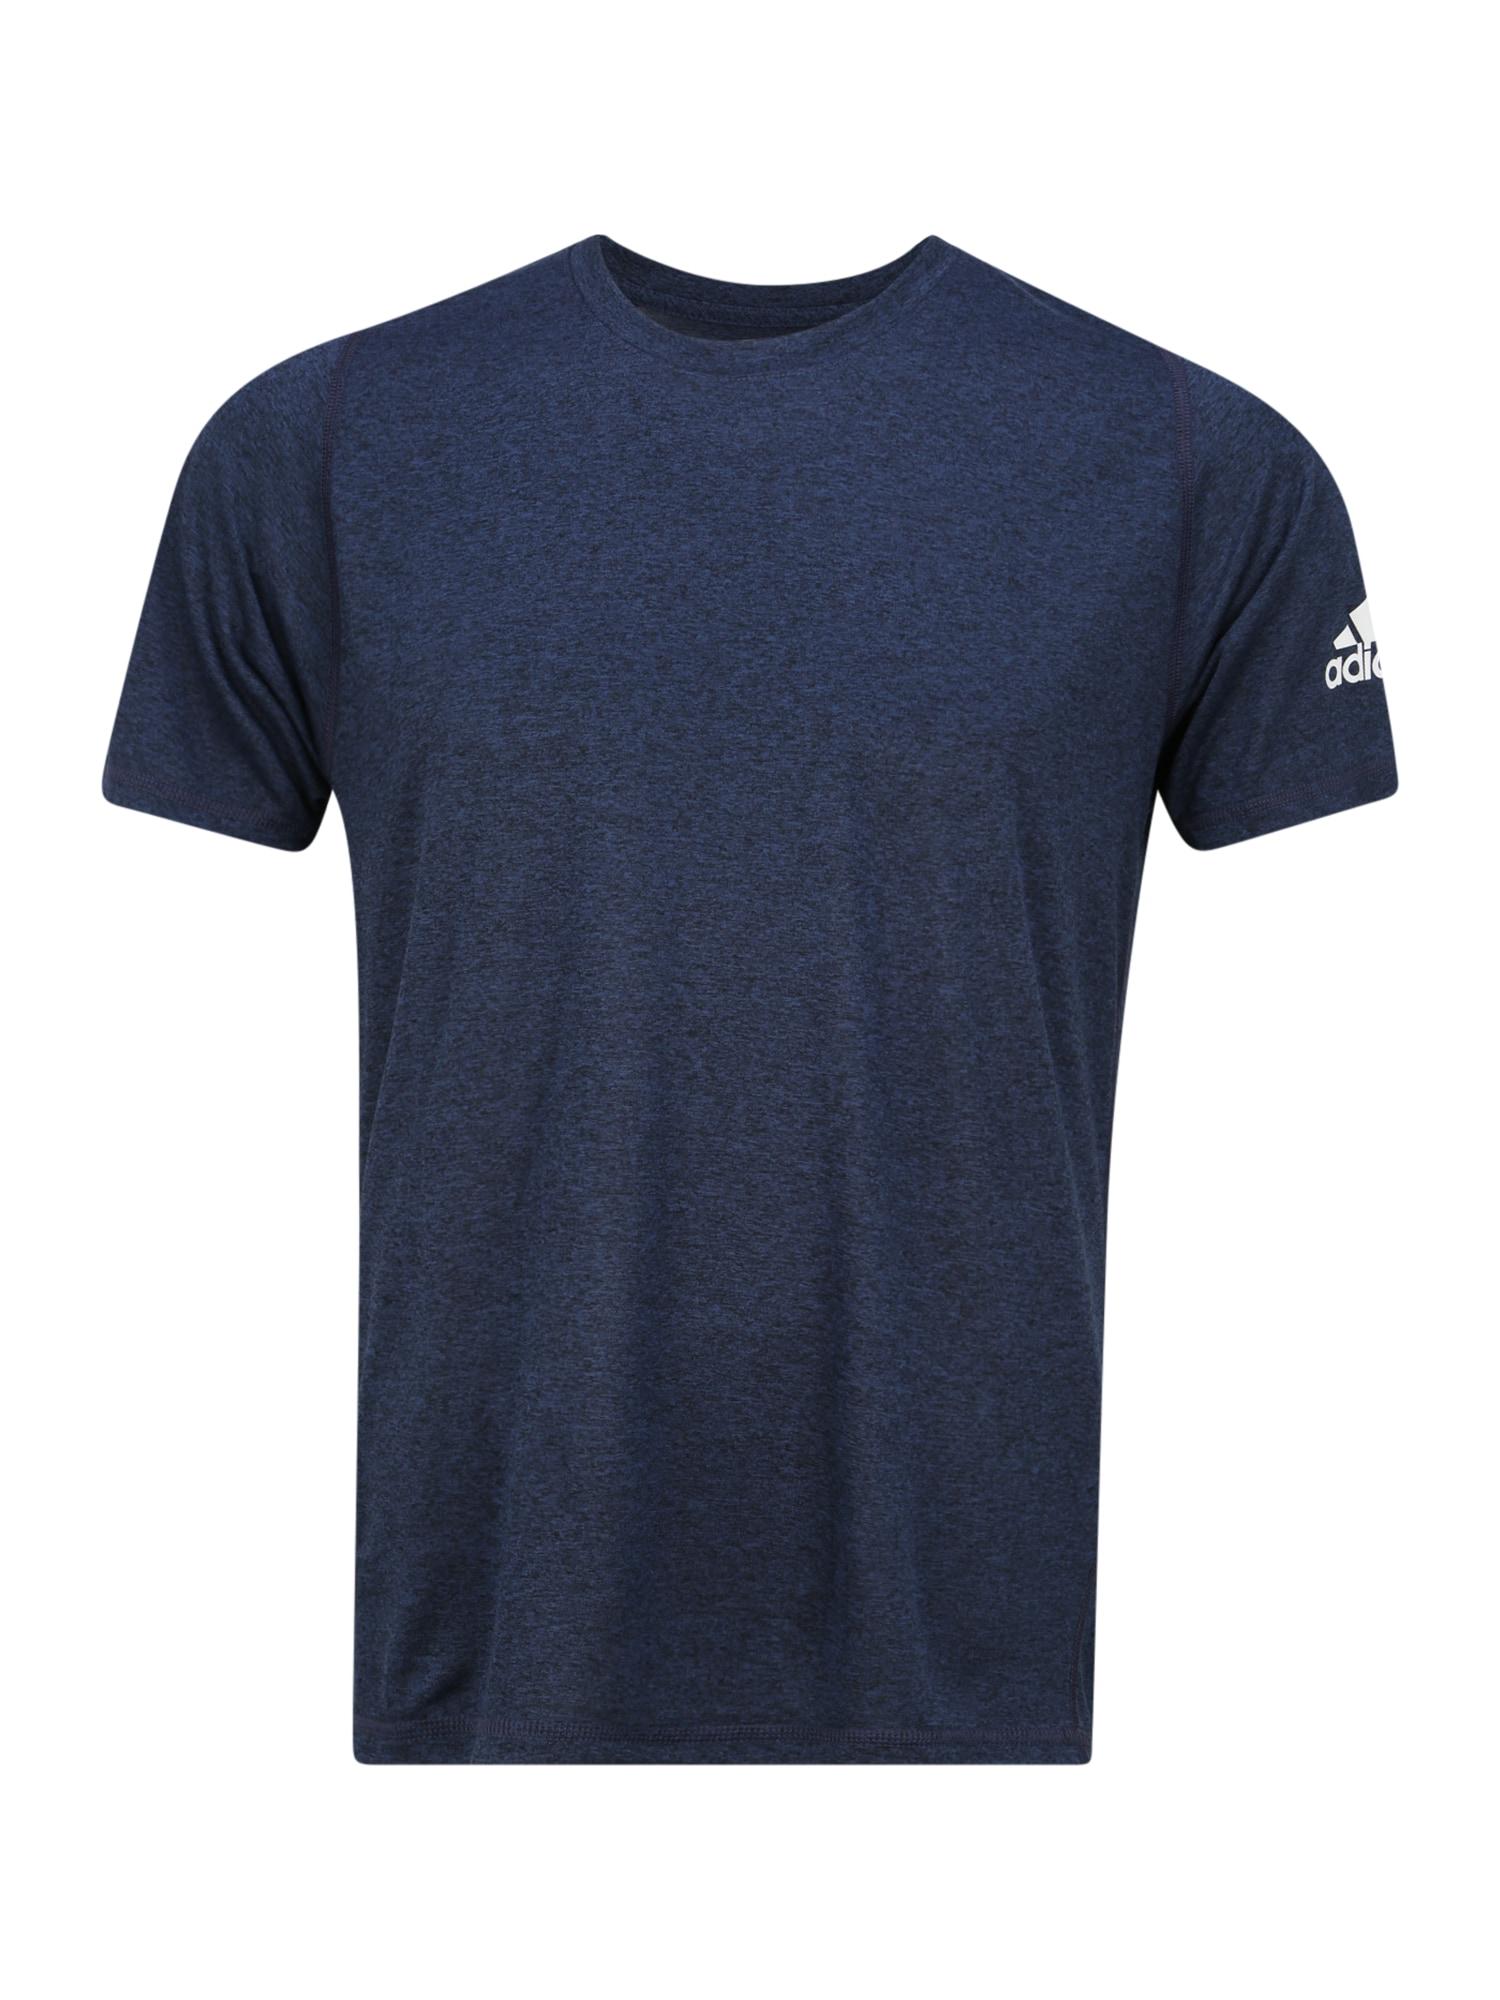 ADIDAS PERFORMANCE Funkční tričko 'FL_SPR X UL HEA'  indigo